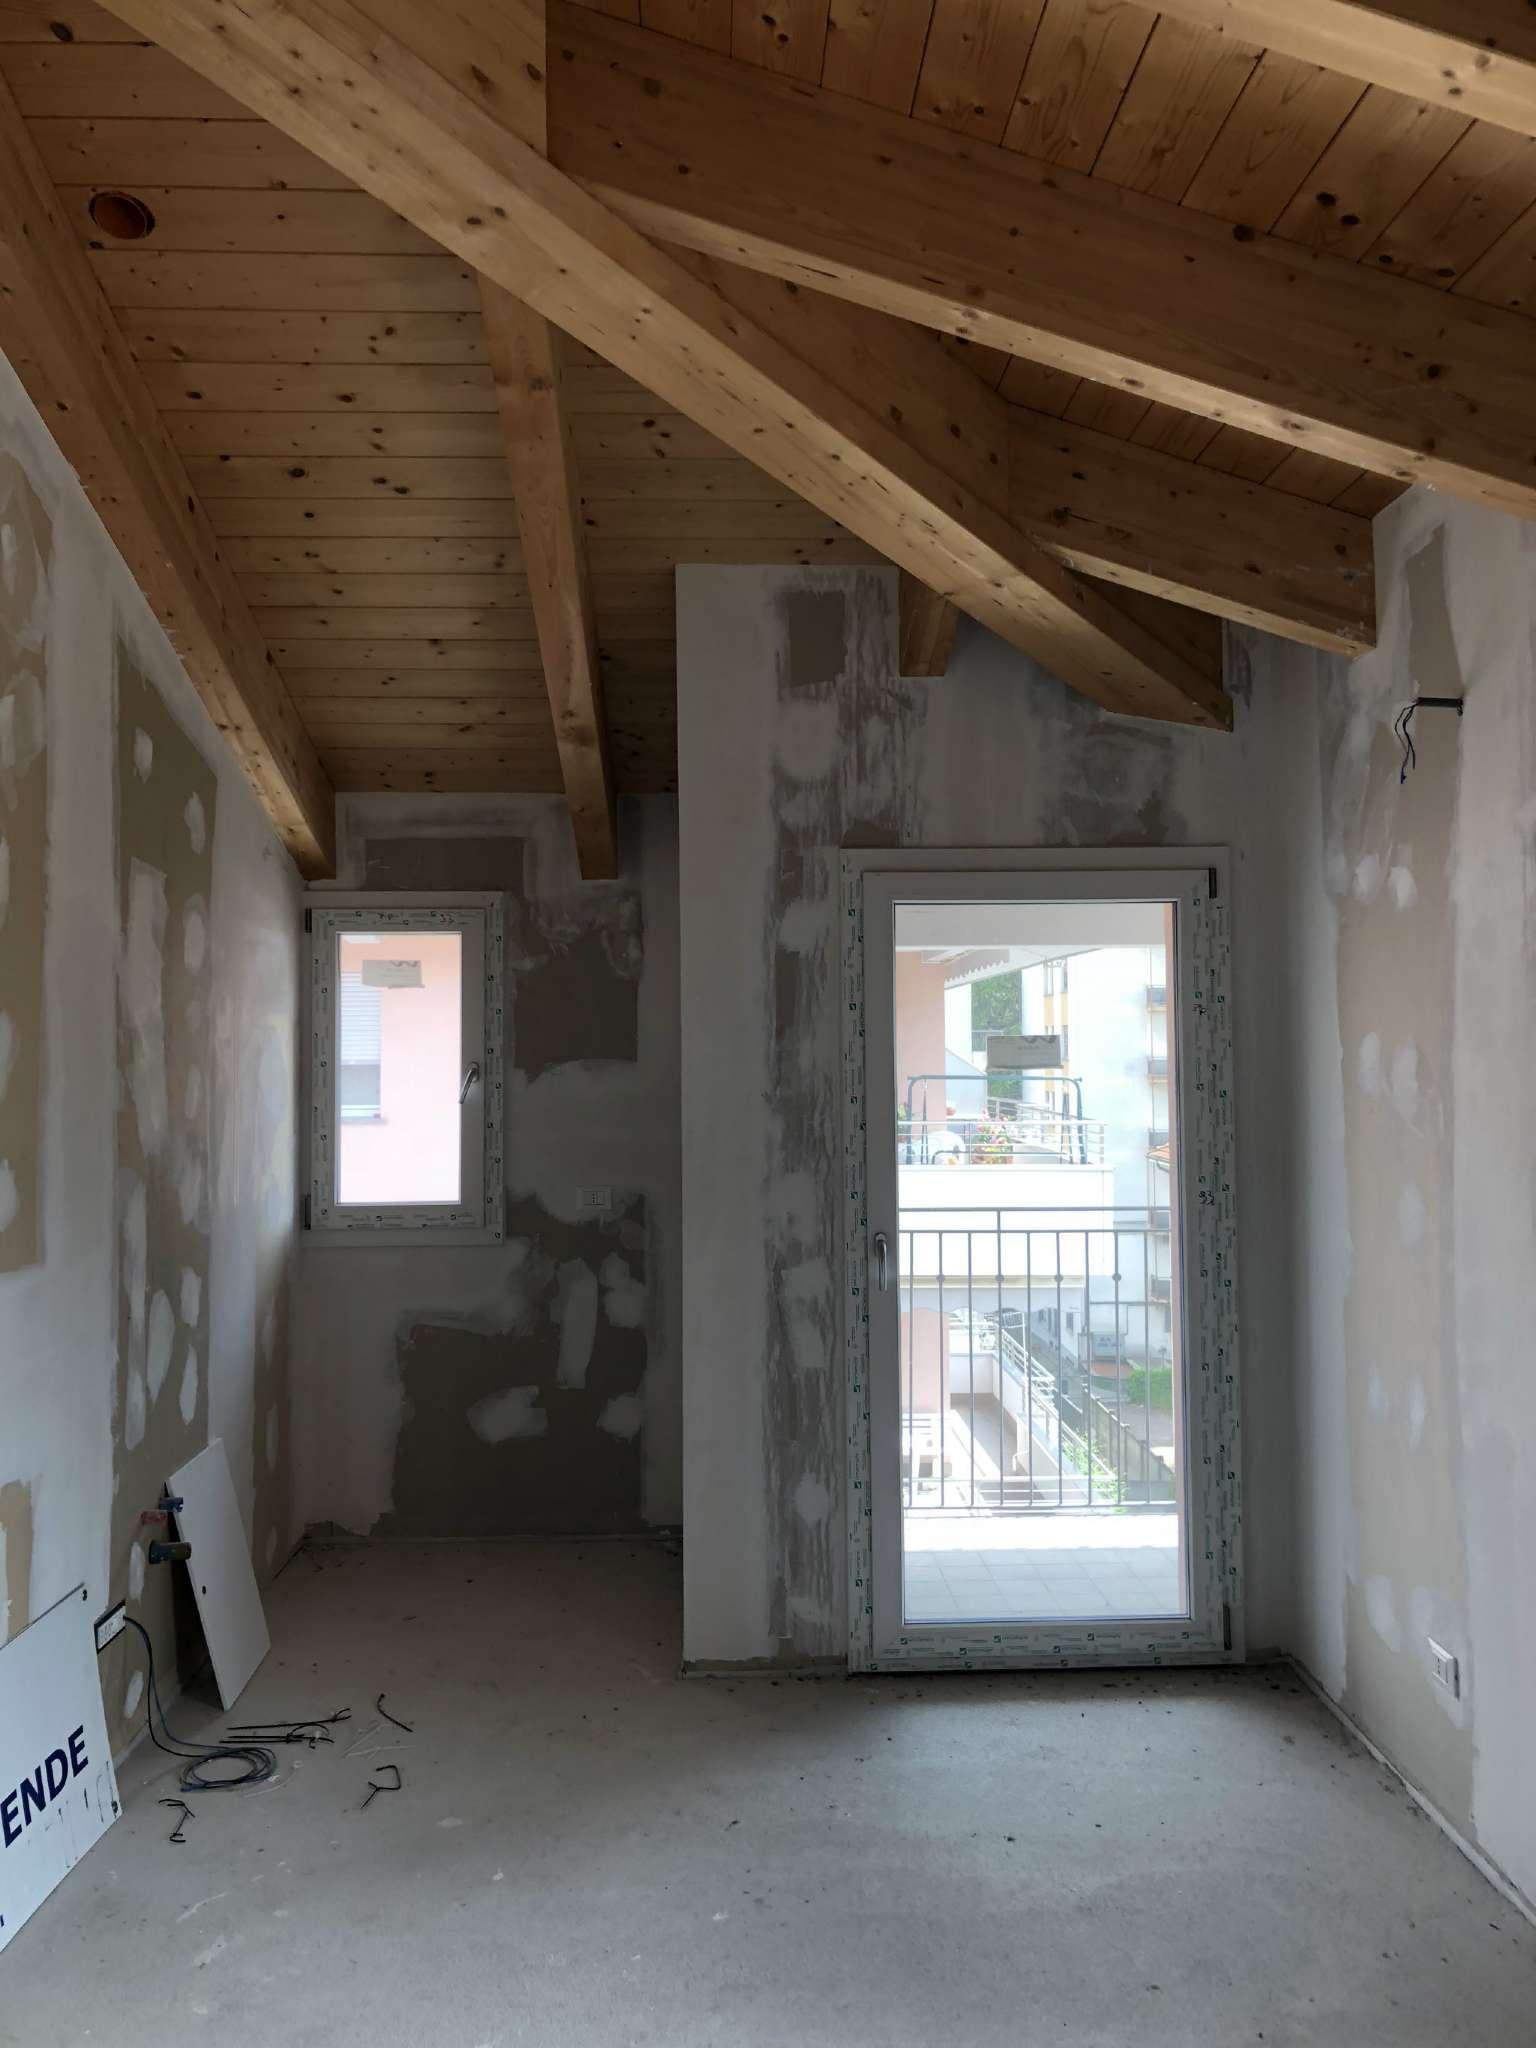 Annunci di case e appartamenti in vendita a olgiate for Case in affitto arredate olgiate comasco